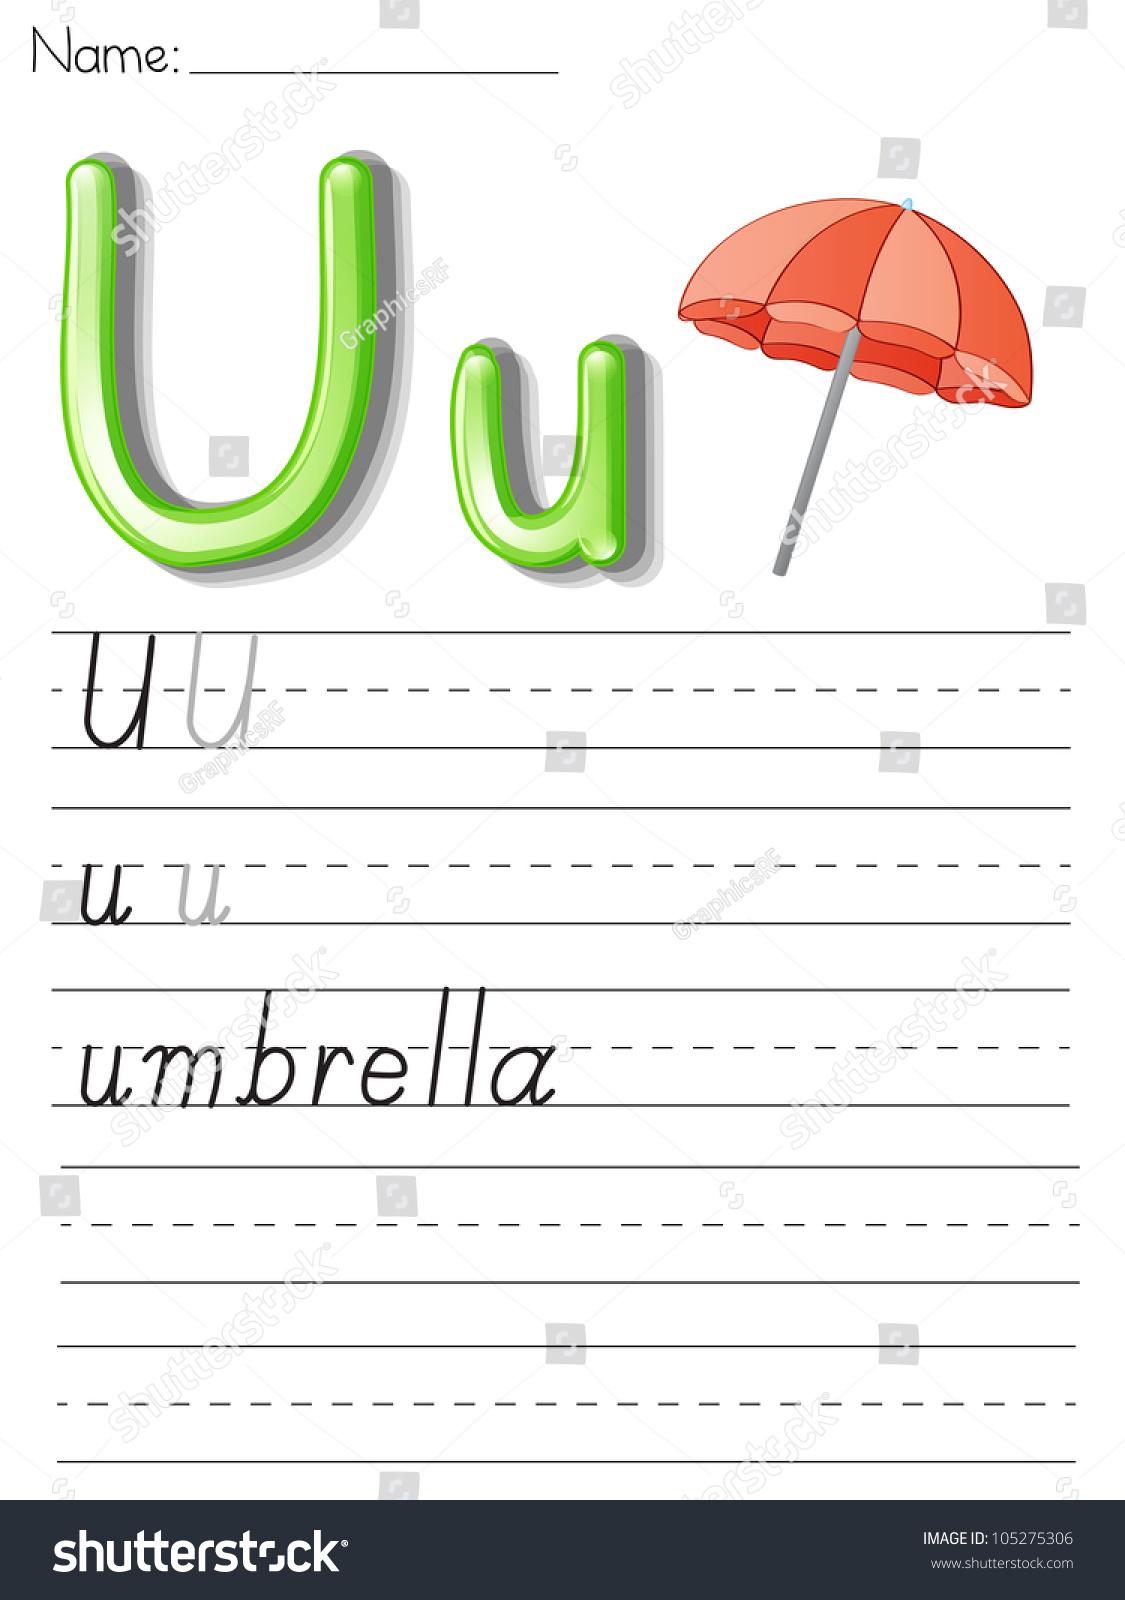 Illustrated Alphabet Worksheet Letter U Stock Illustration